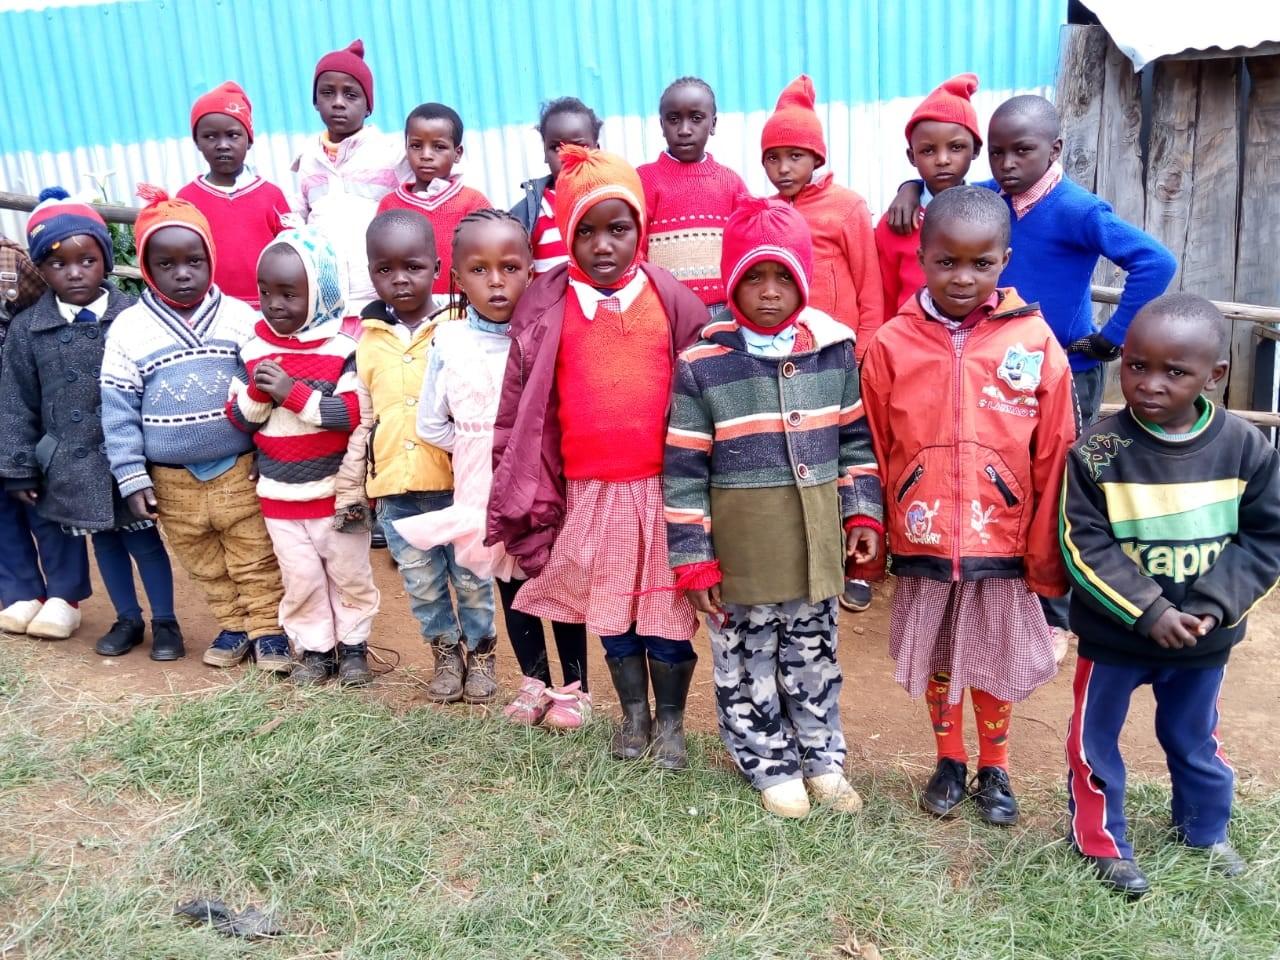 volunteer project: Star of Hope Community Center Nyeri photo 1